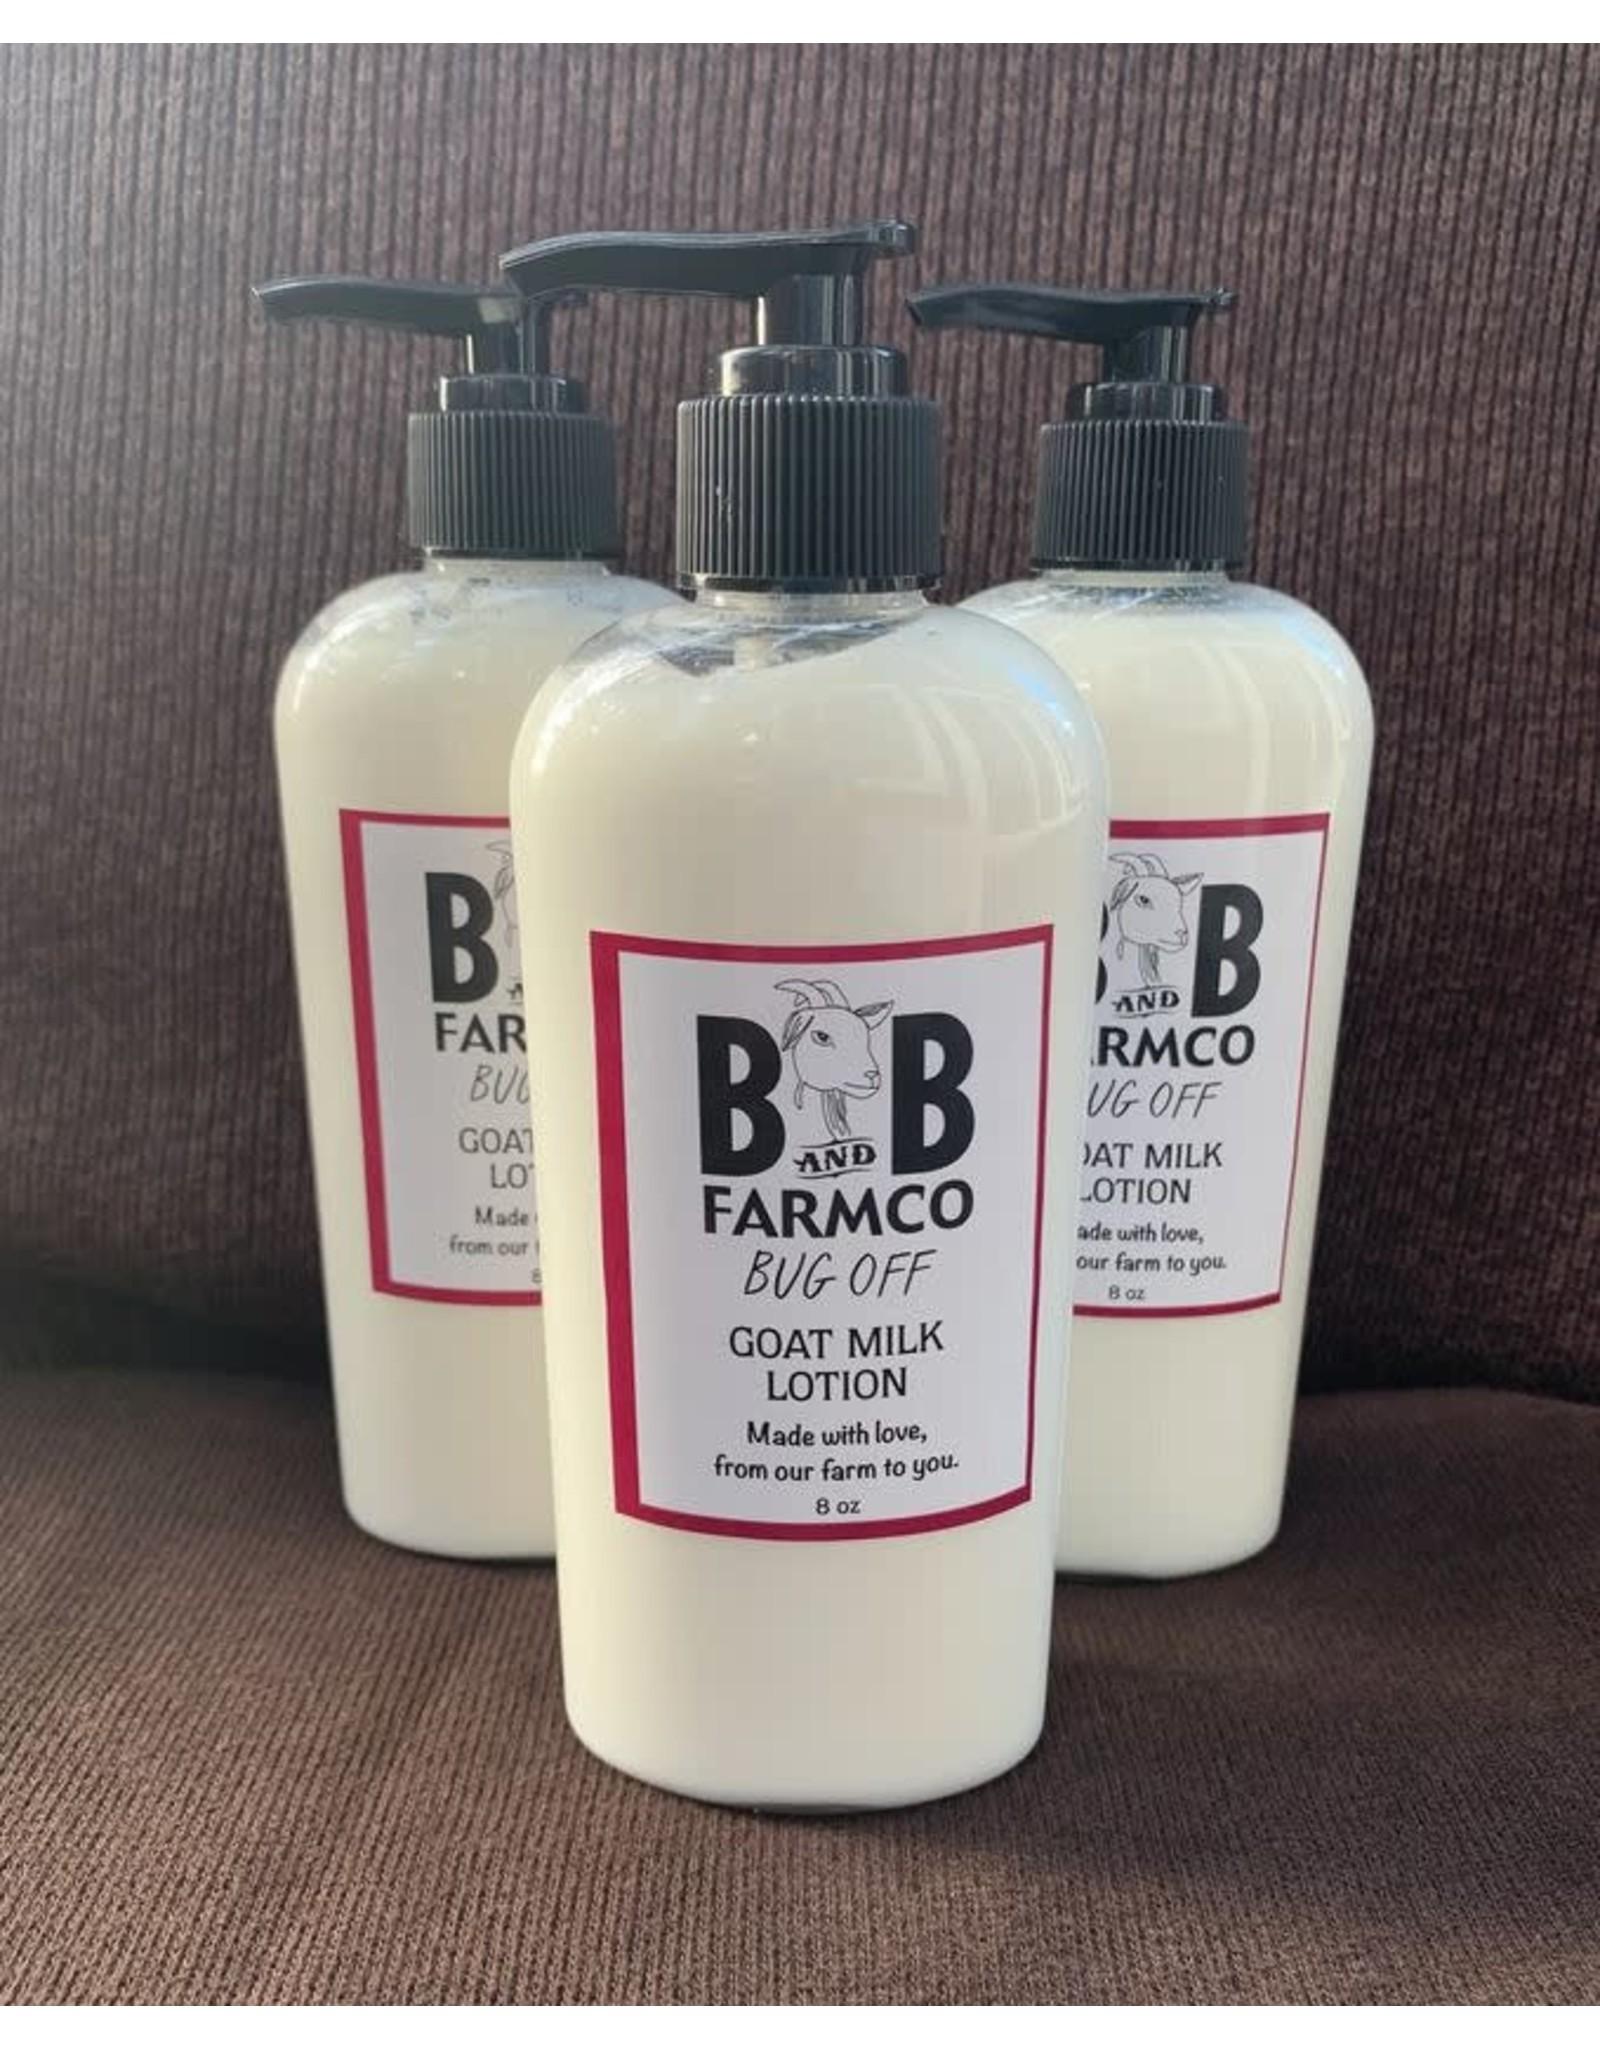 B&B FARM CO B&B BUG OFF GOAT MILK LOTION